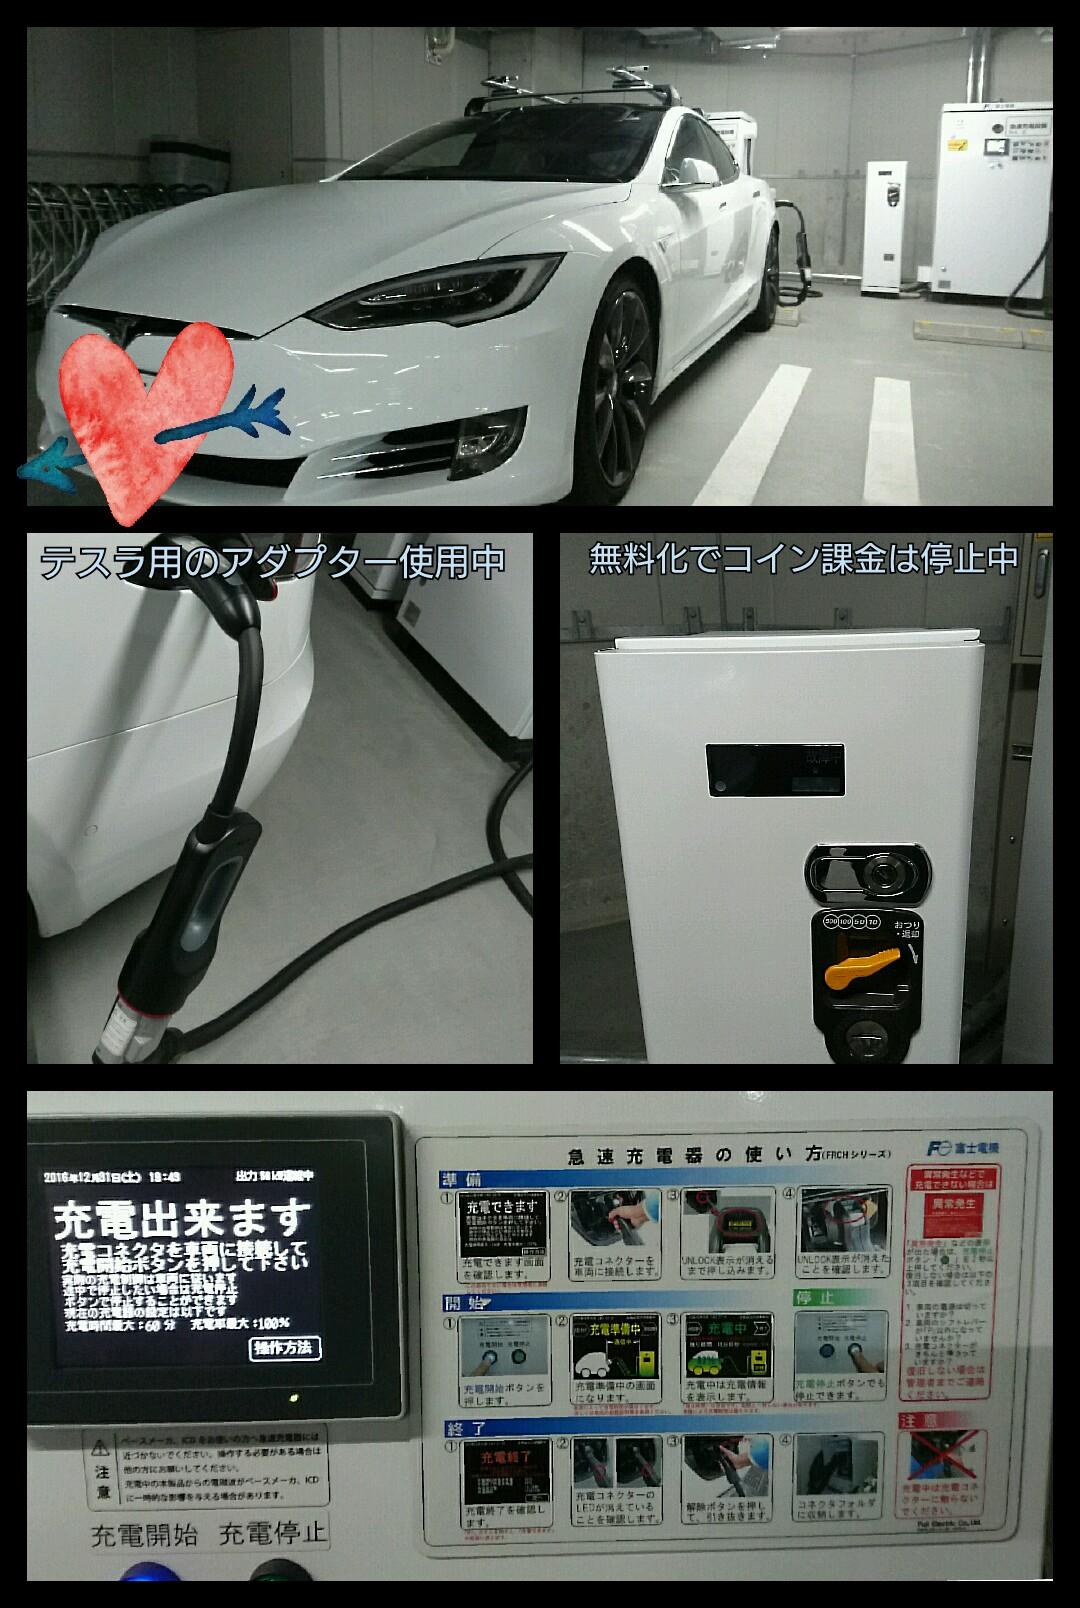 EV充電スポット 二子玉川東急ライズ 駐車場